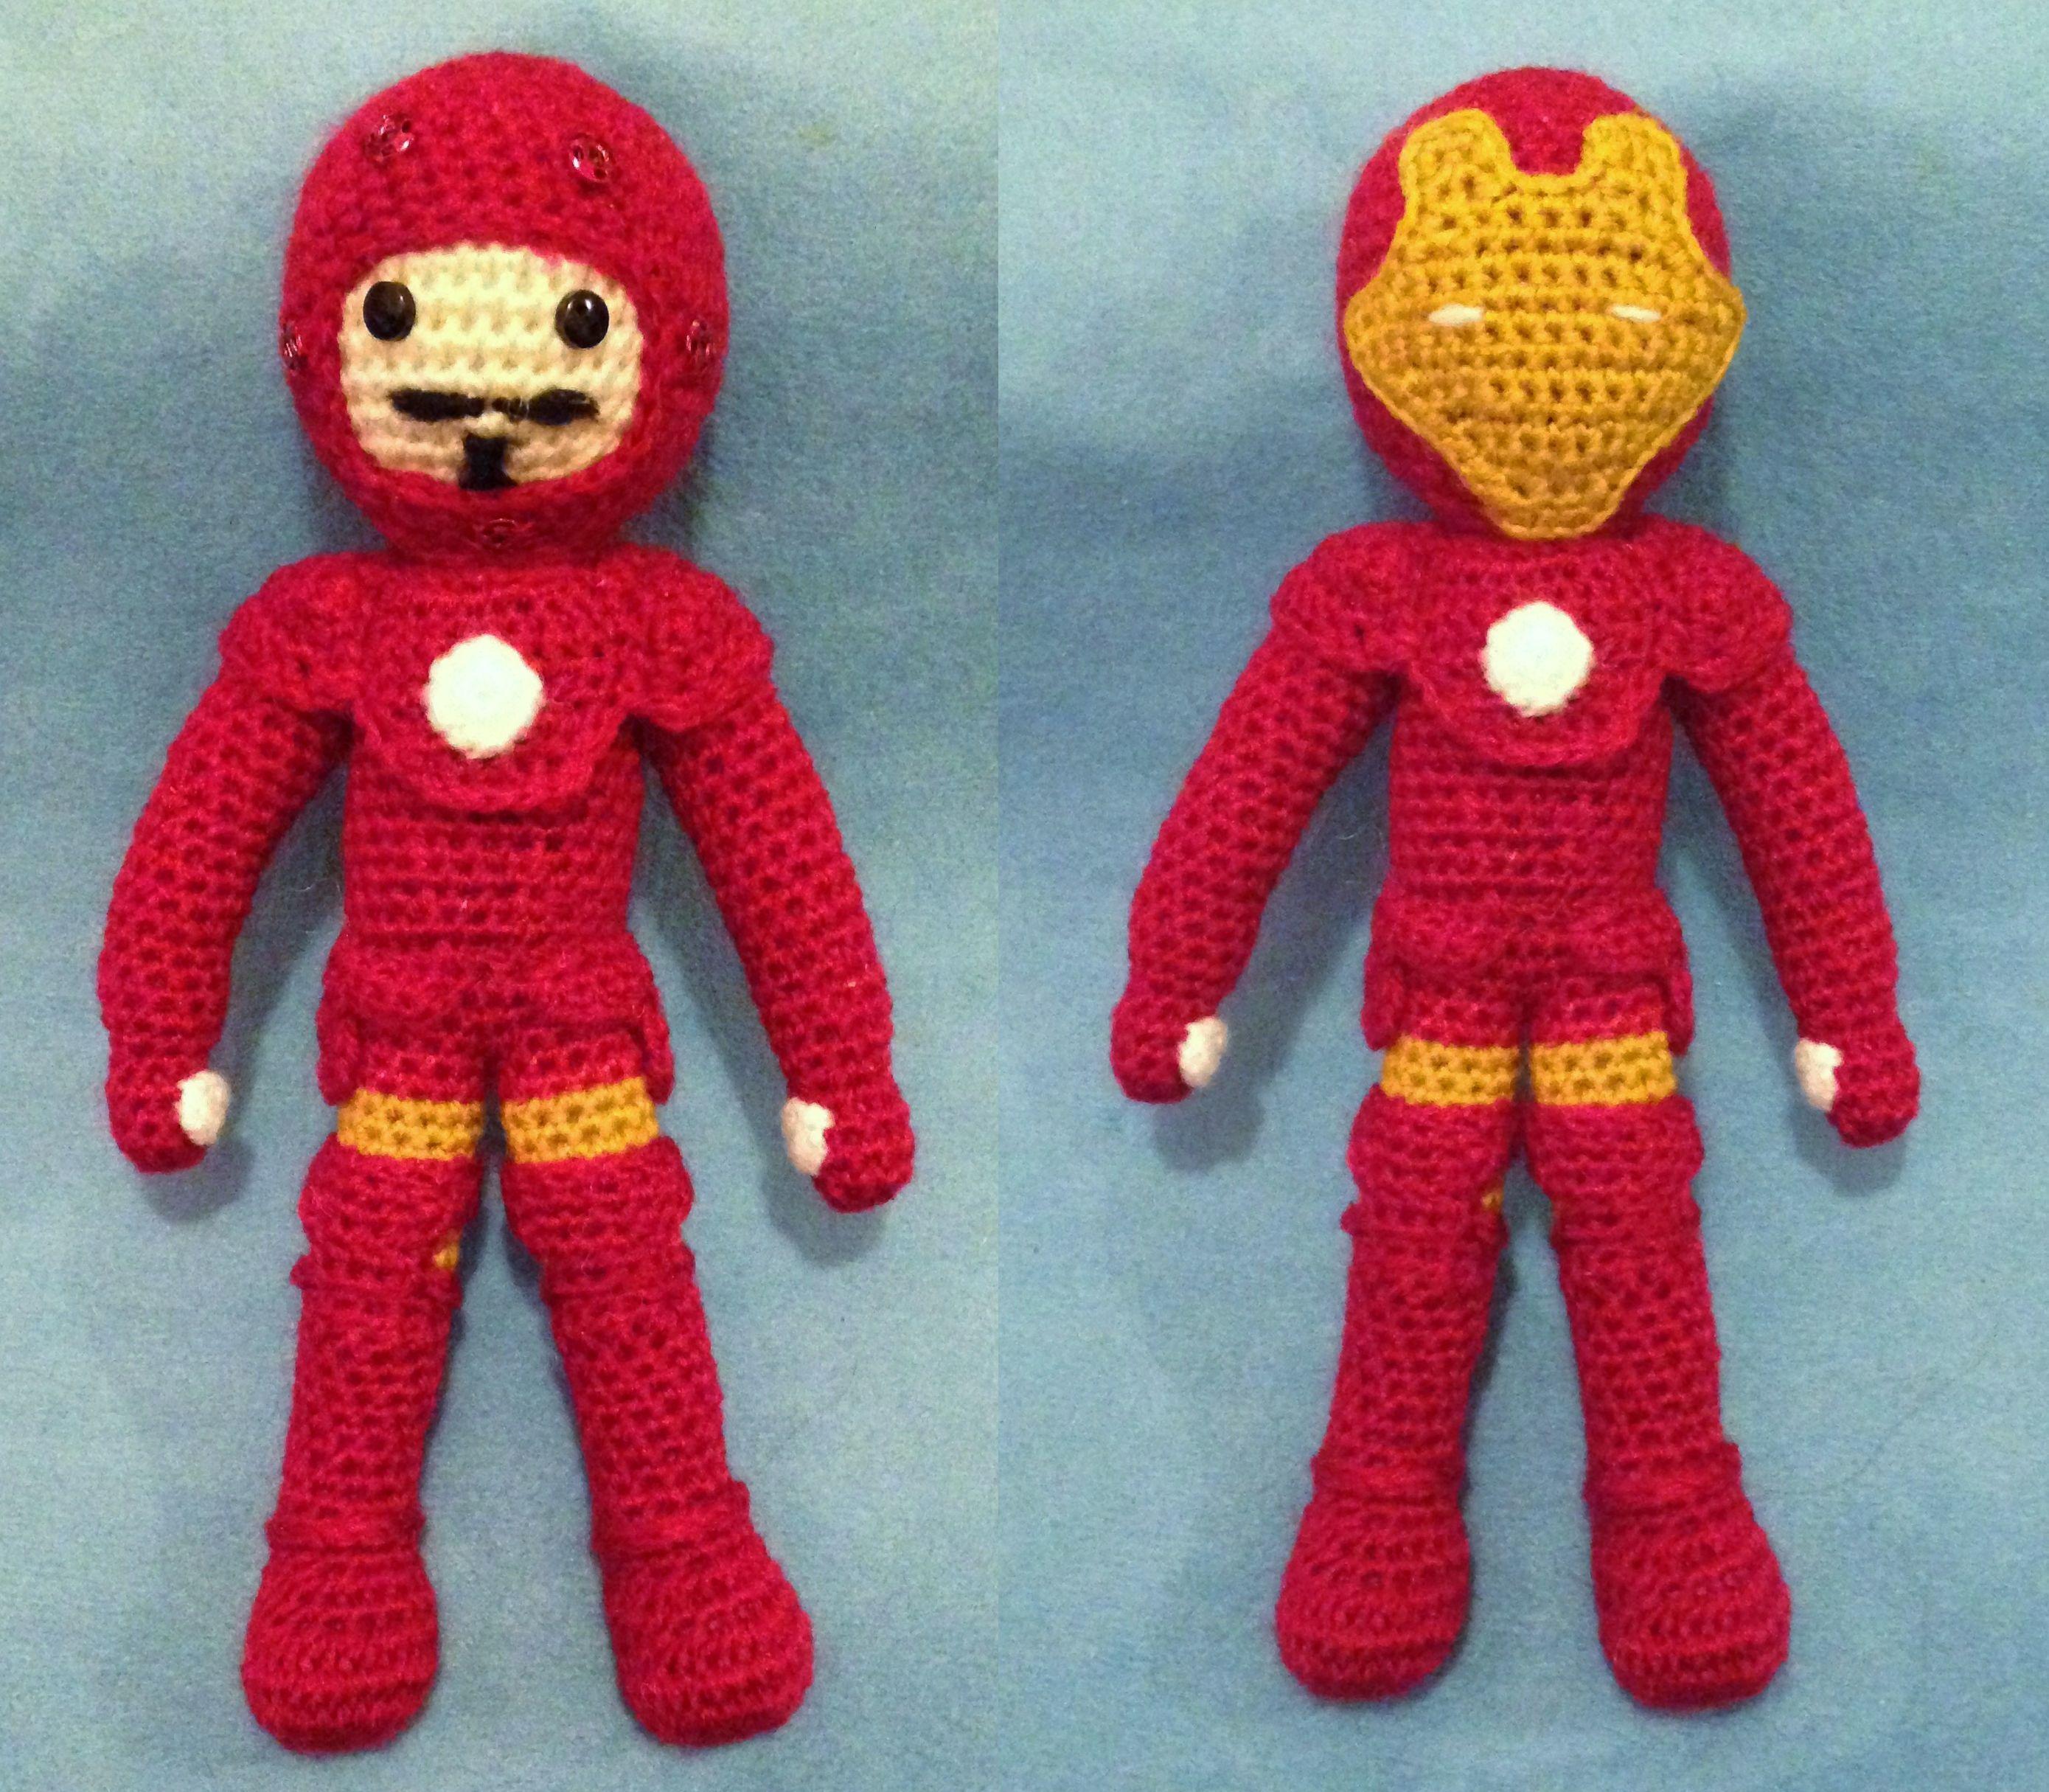 Iron Man amigurumi   Crochet projects, Crochet patterns ...